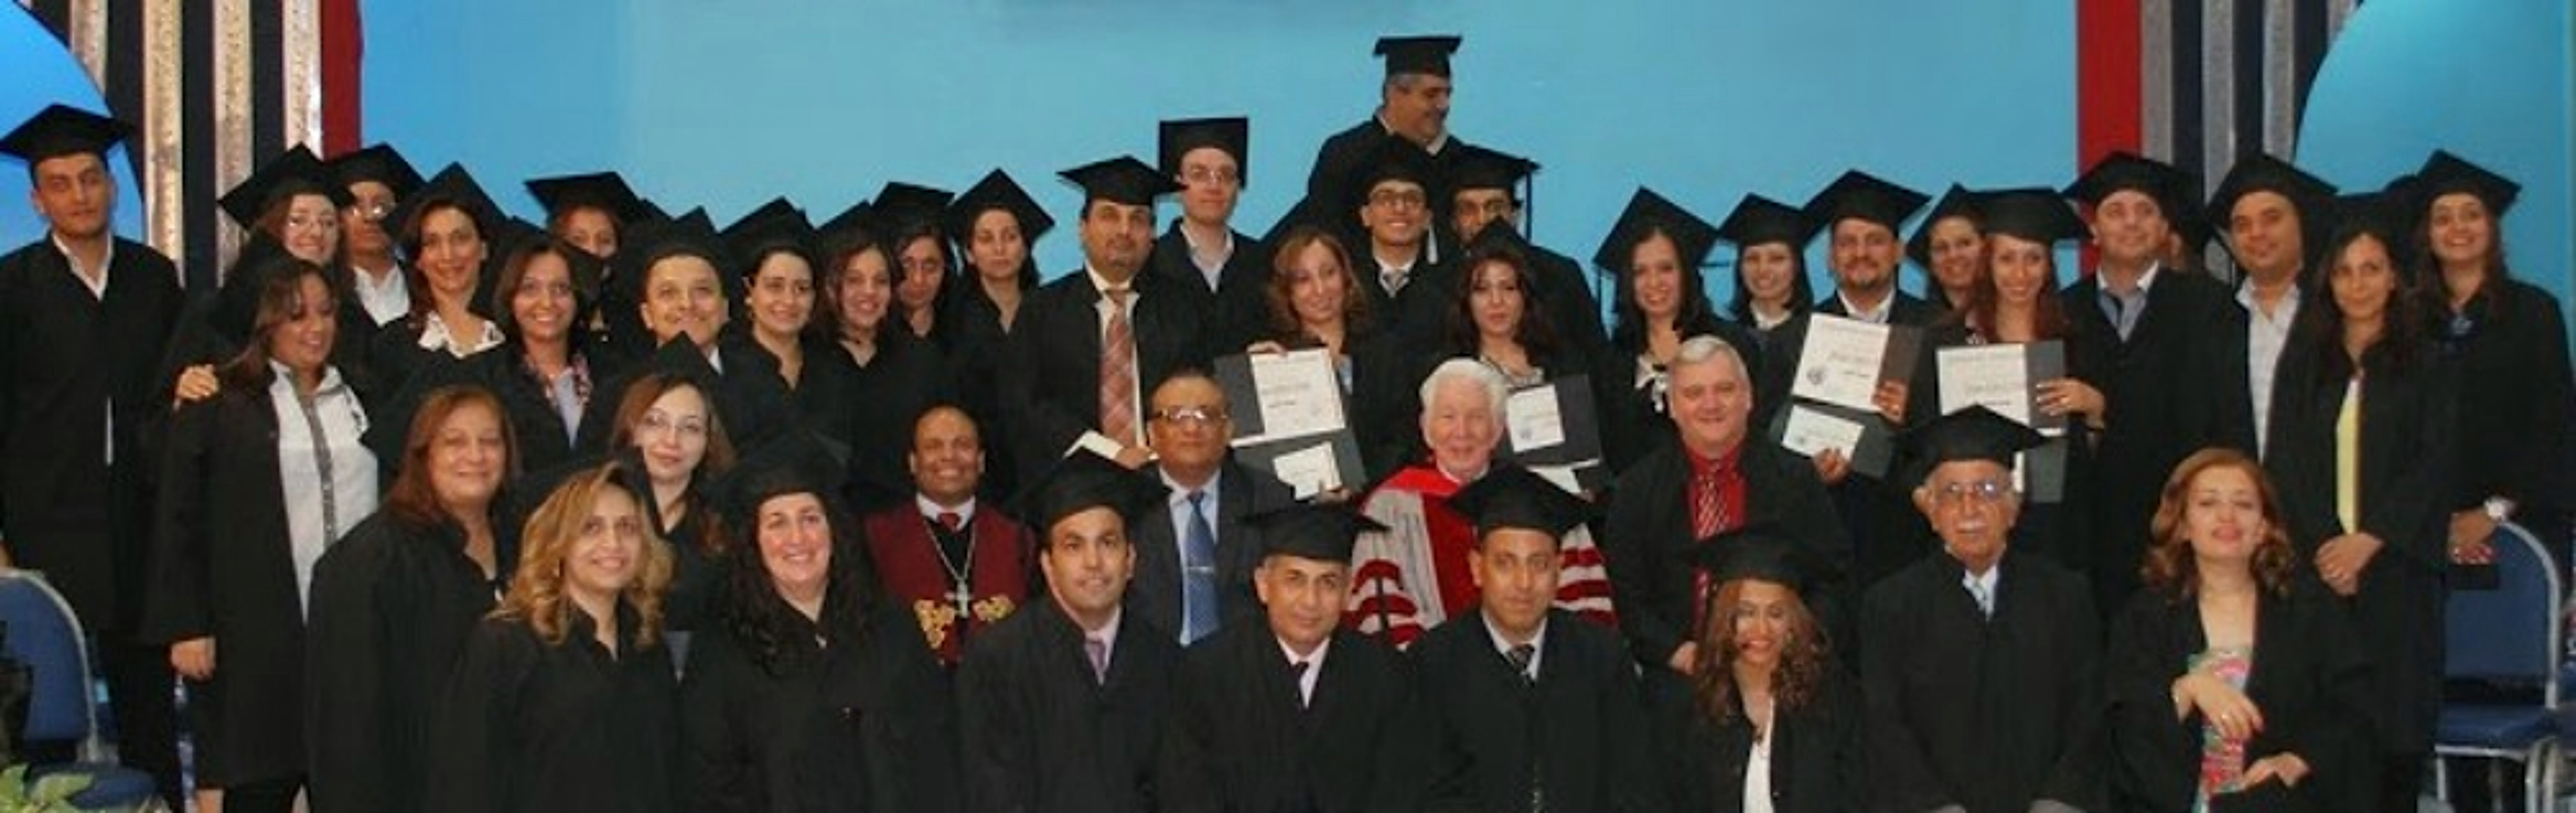 Egyptian Grads